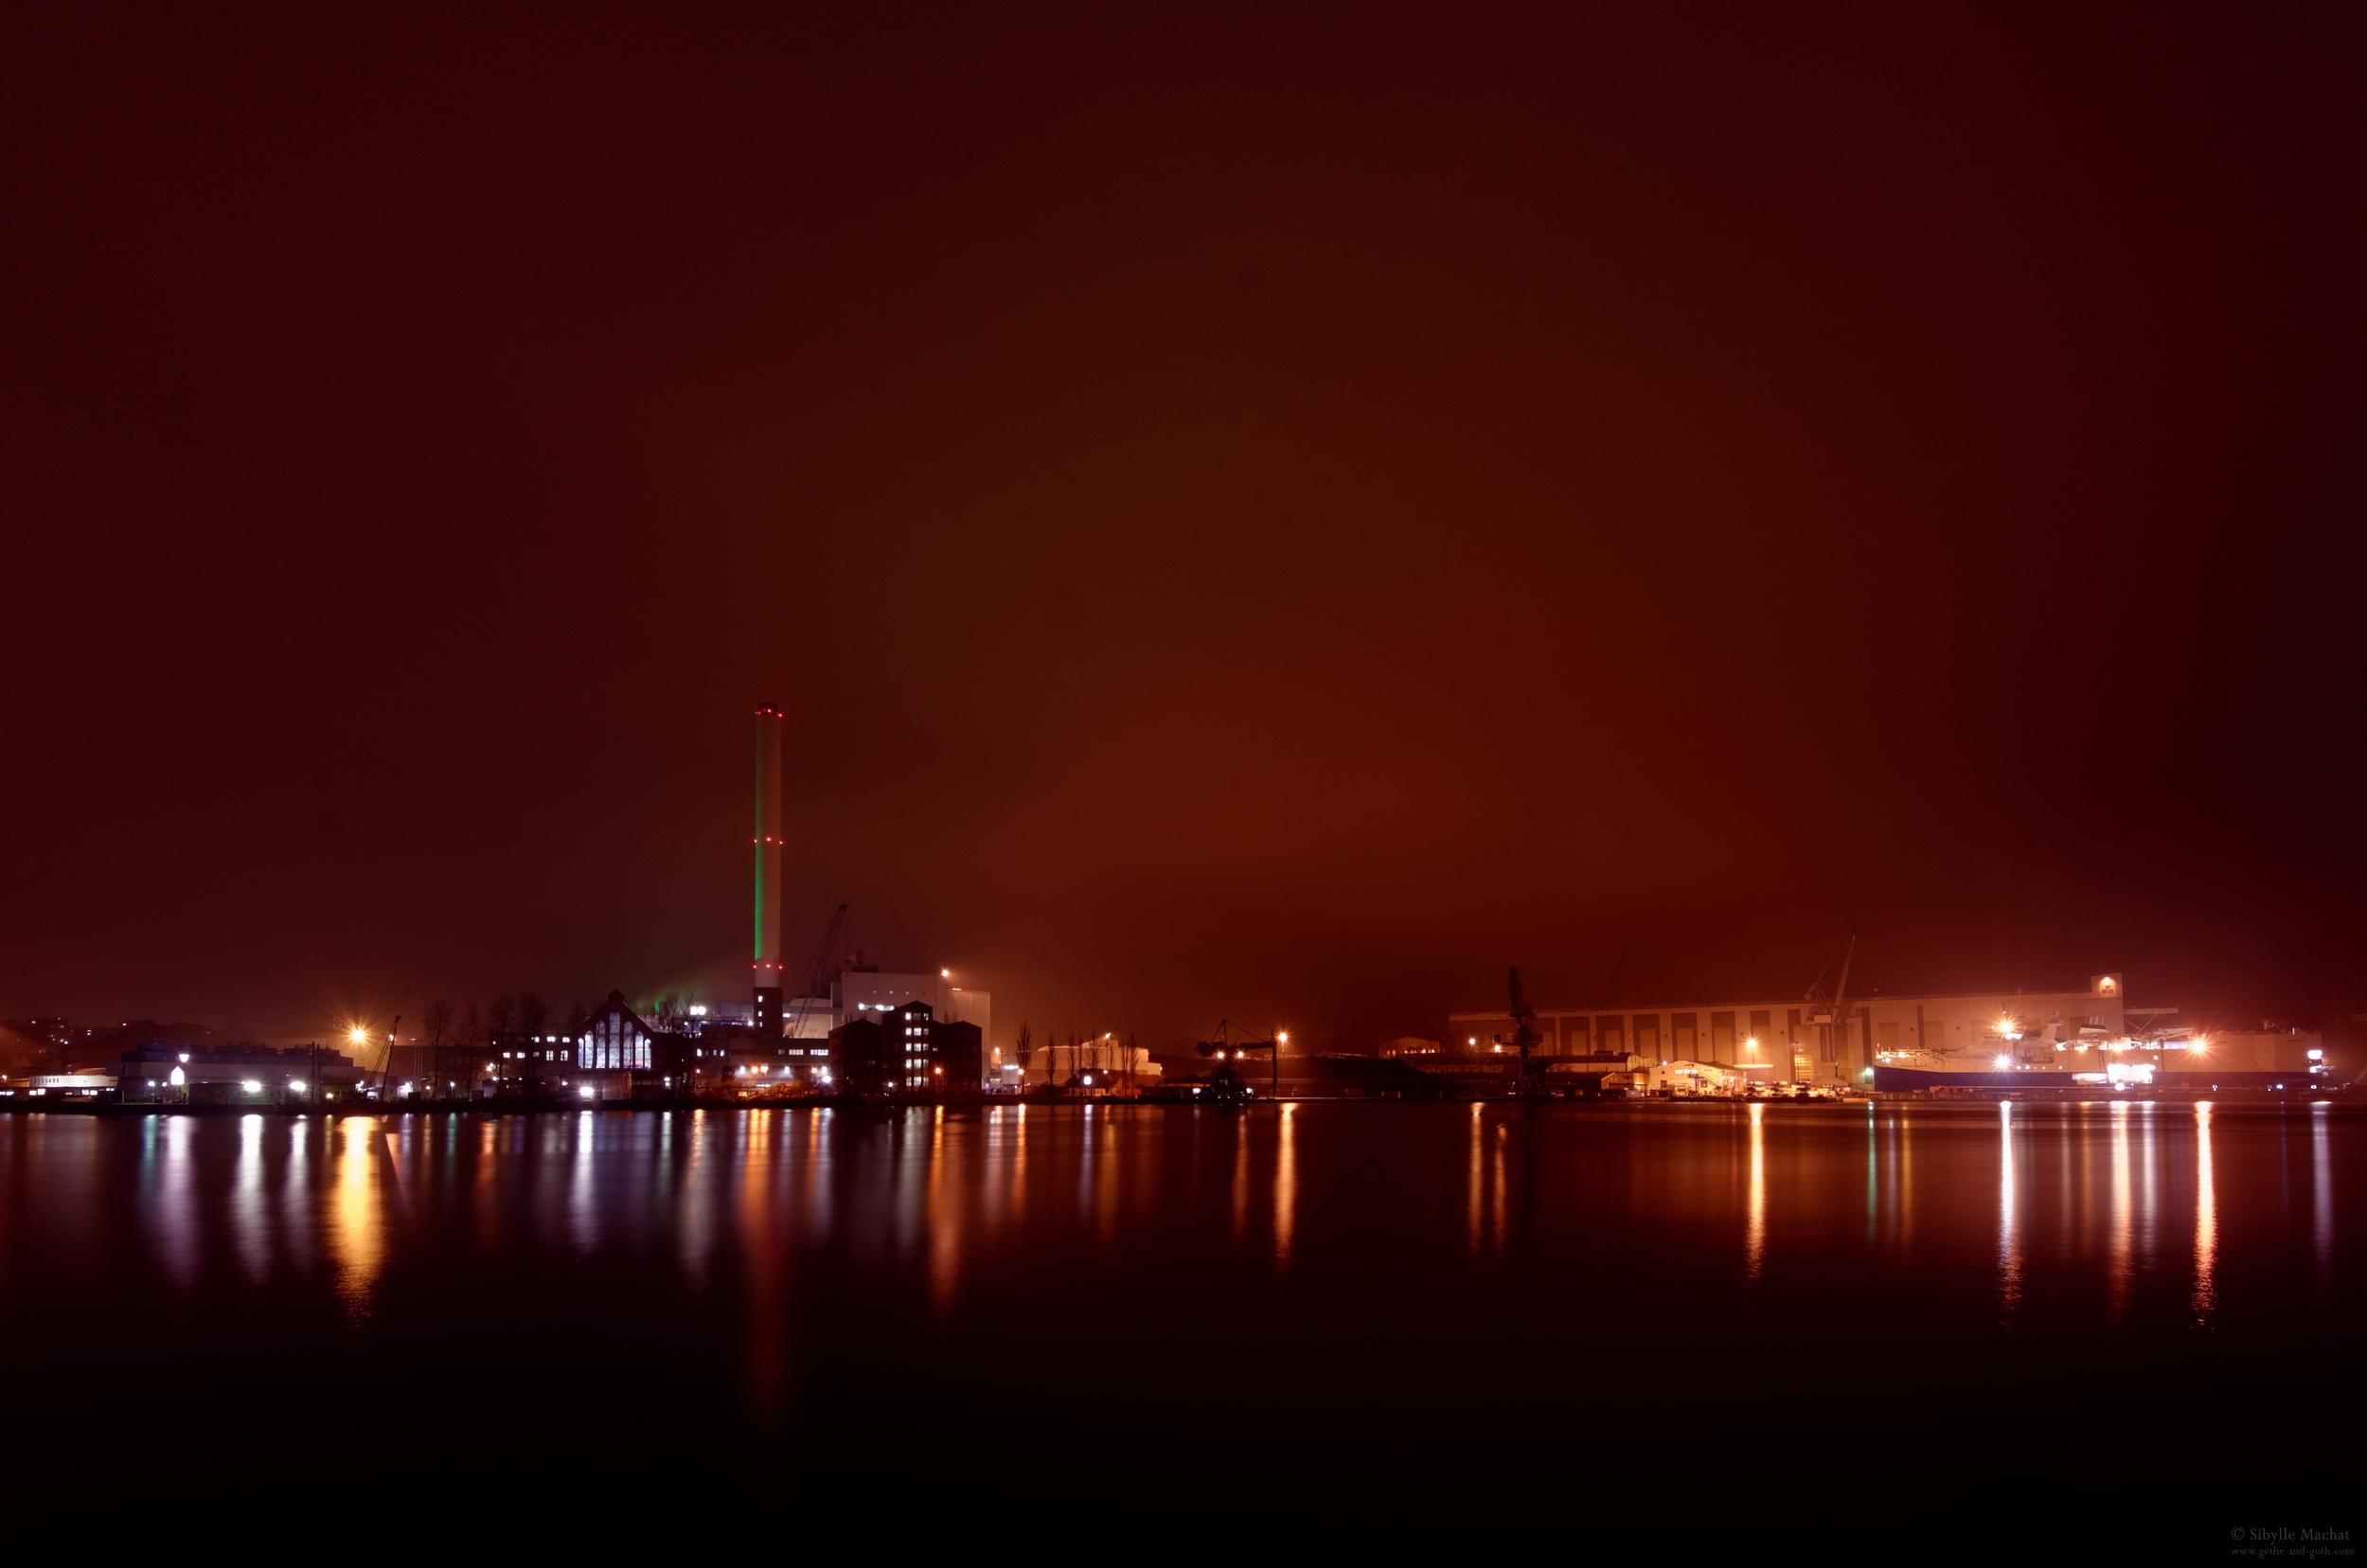 Flensburg at night